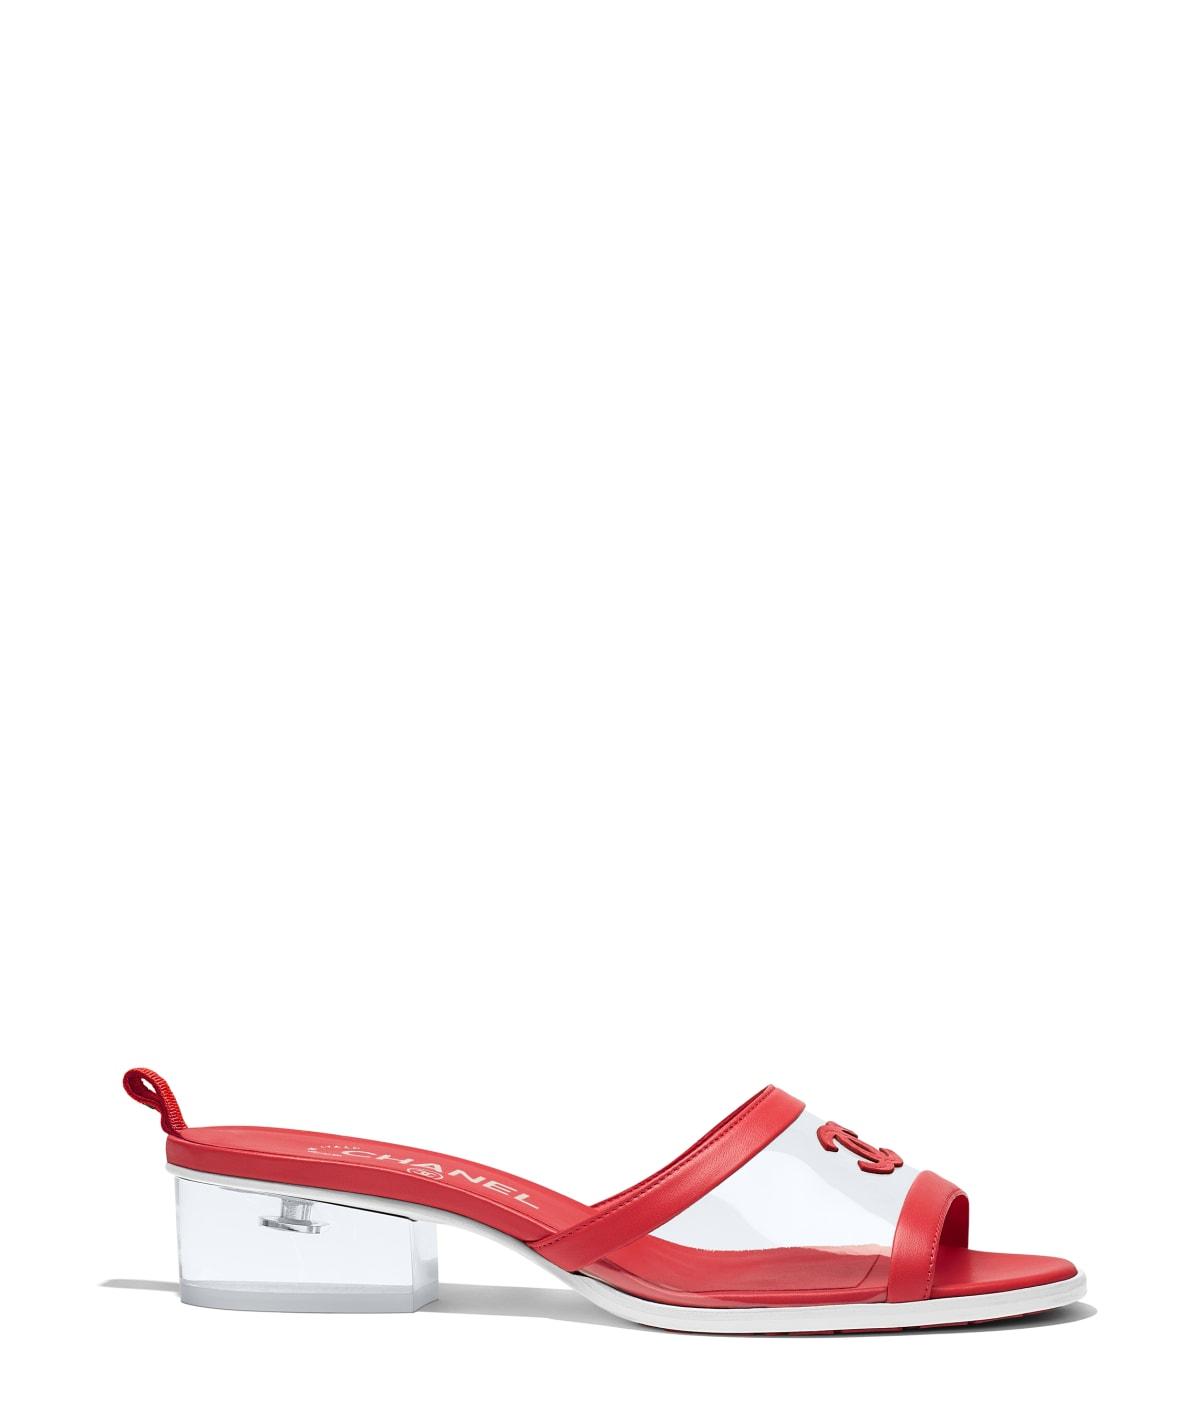 2ba3c0cf026f Shoes - CHANEL